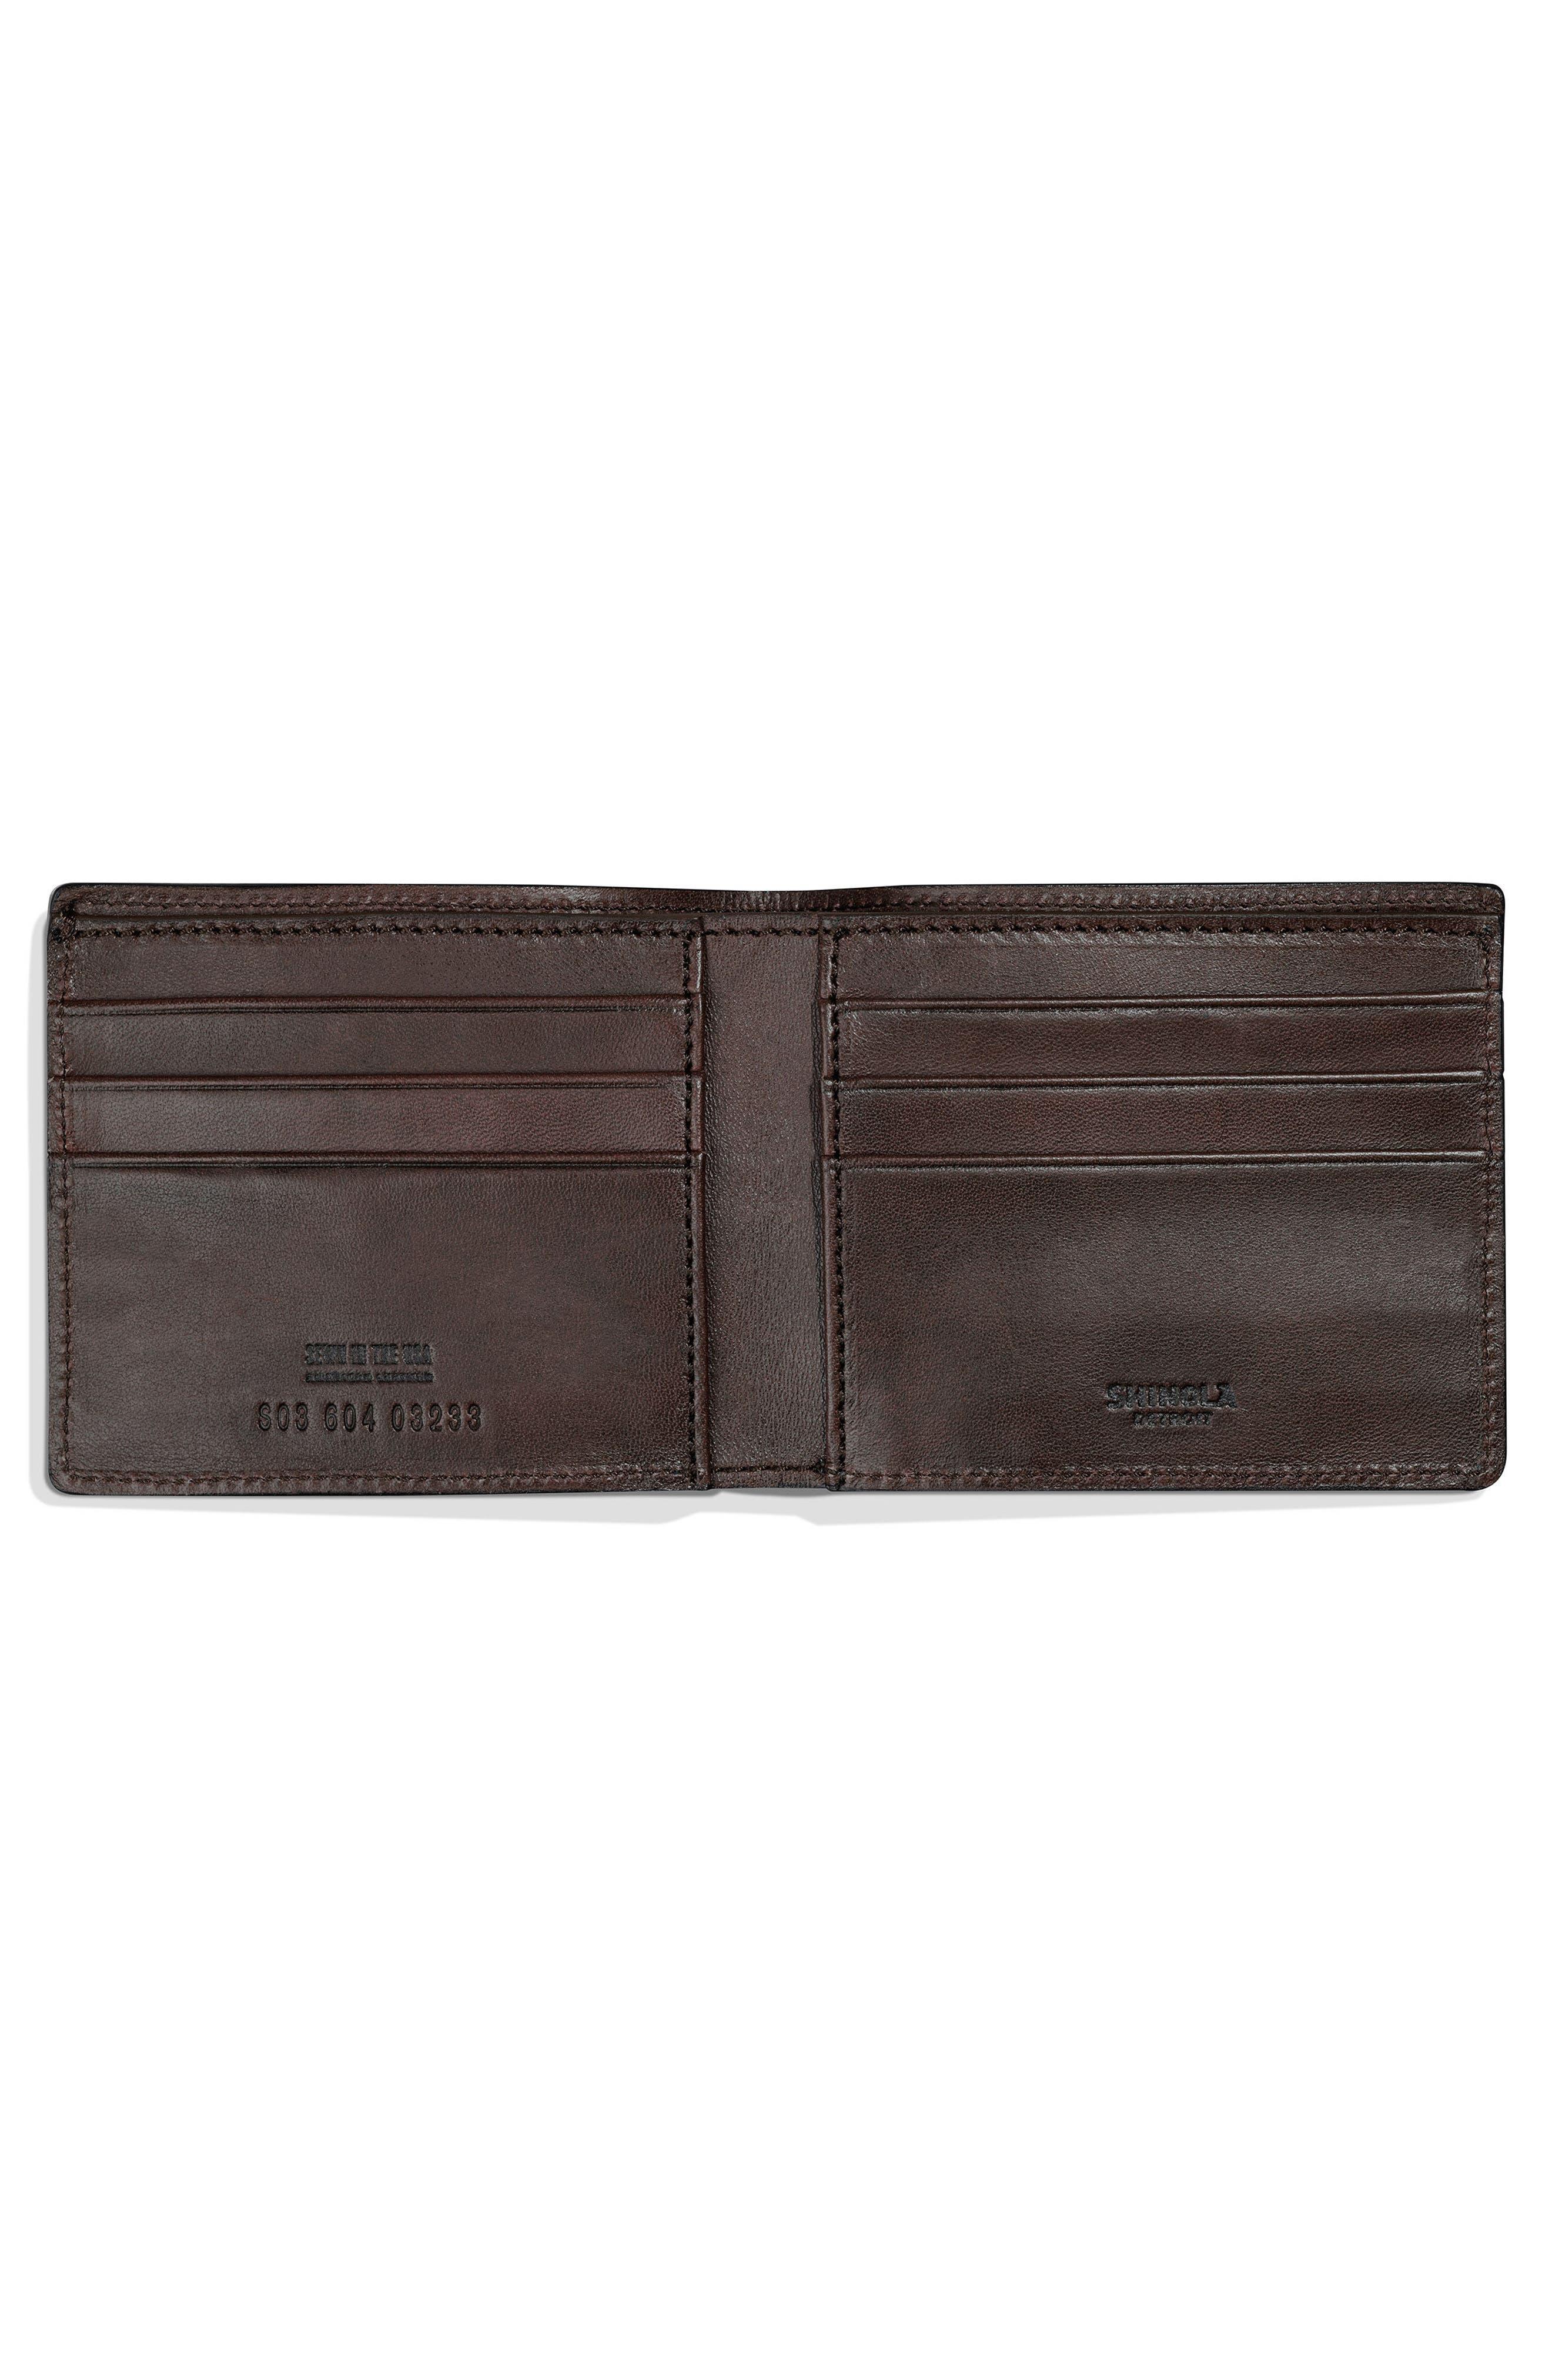 Bolt Leather Wallet,                             Alternate thumbnail 3, color,                             240